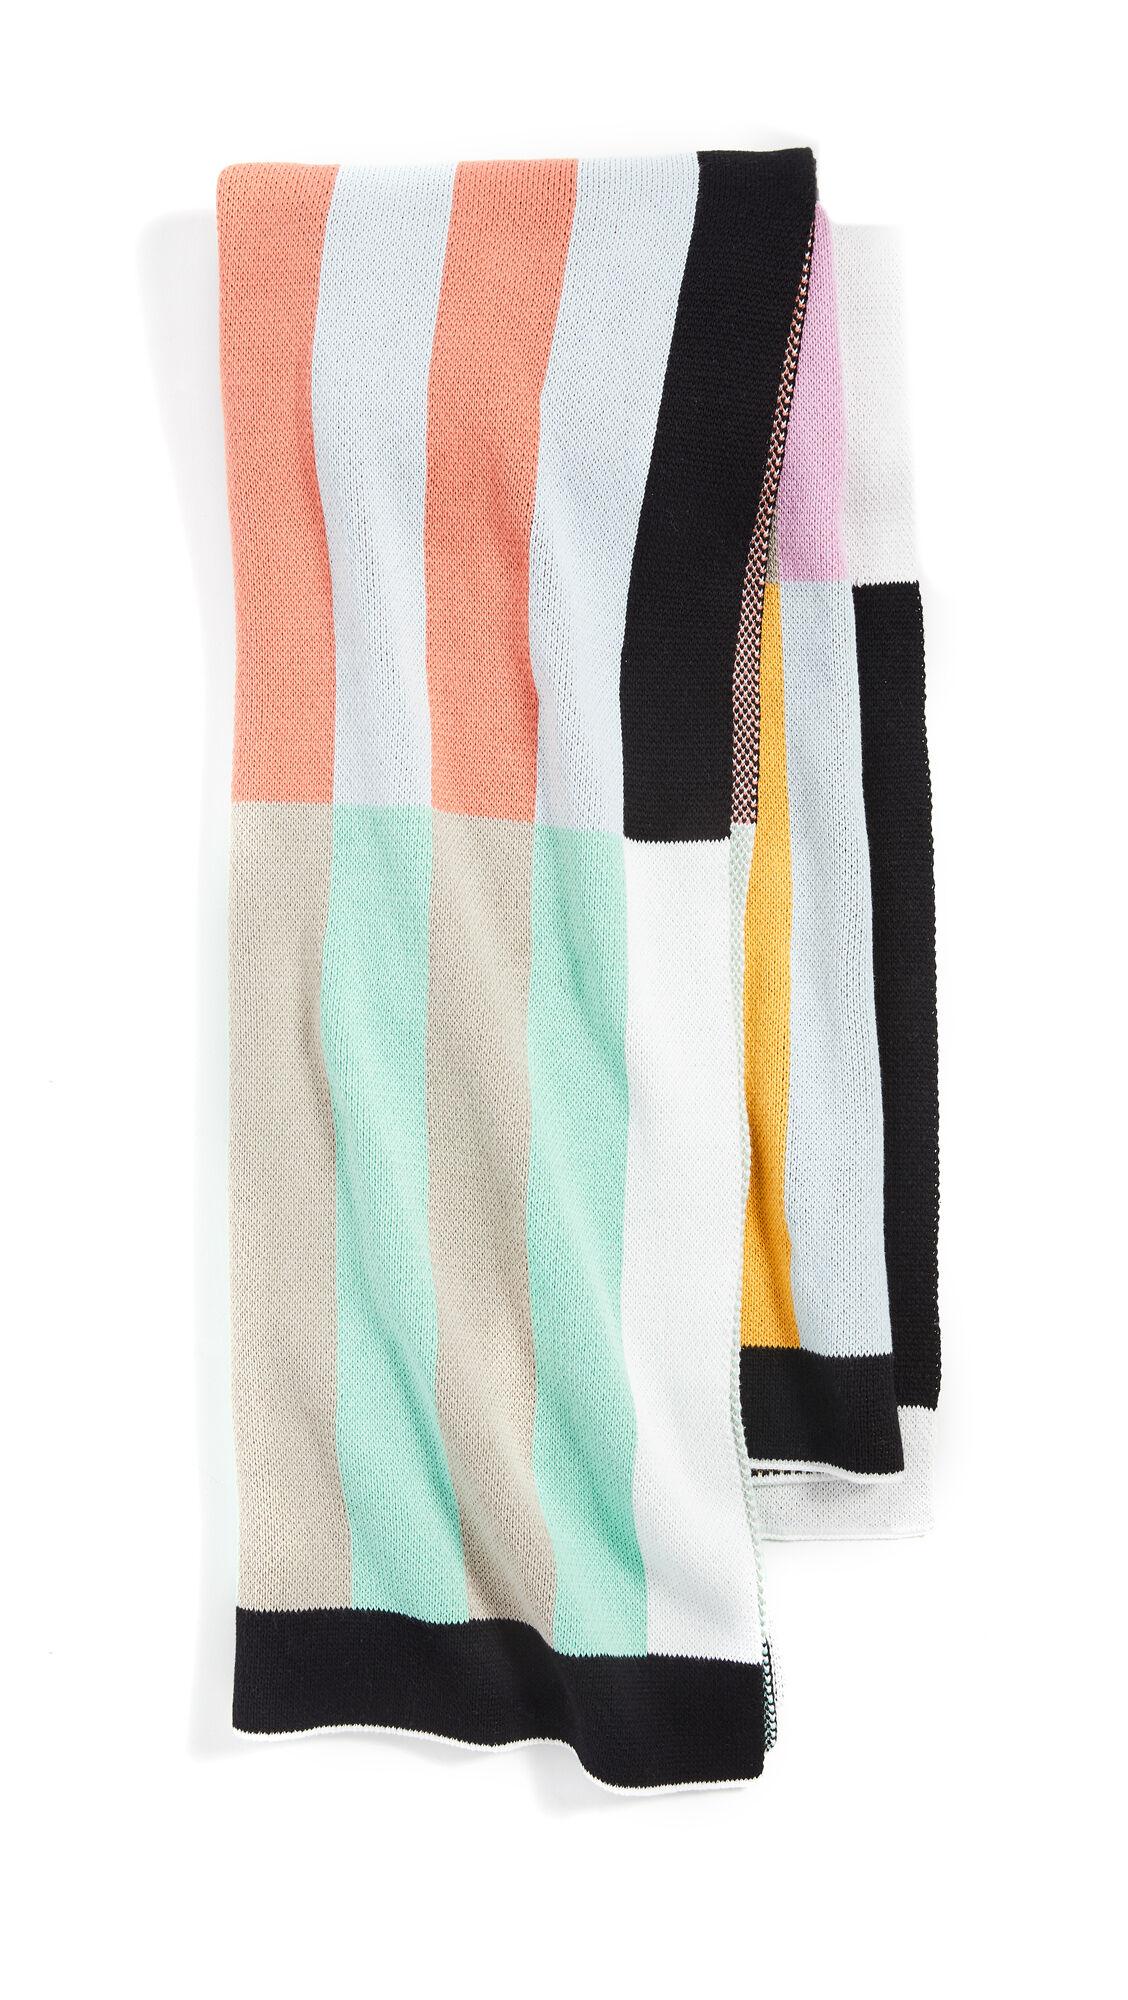 Shopbop Home Shopbop @Home Dusen Dusen Knit Throw  - Multi Stripe - Size: One Size